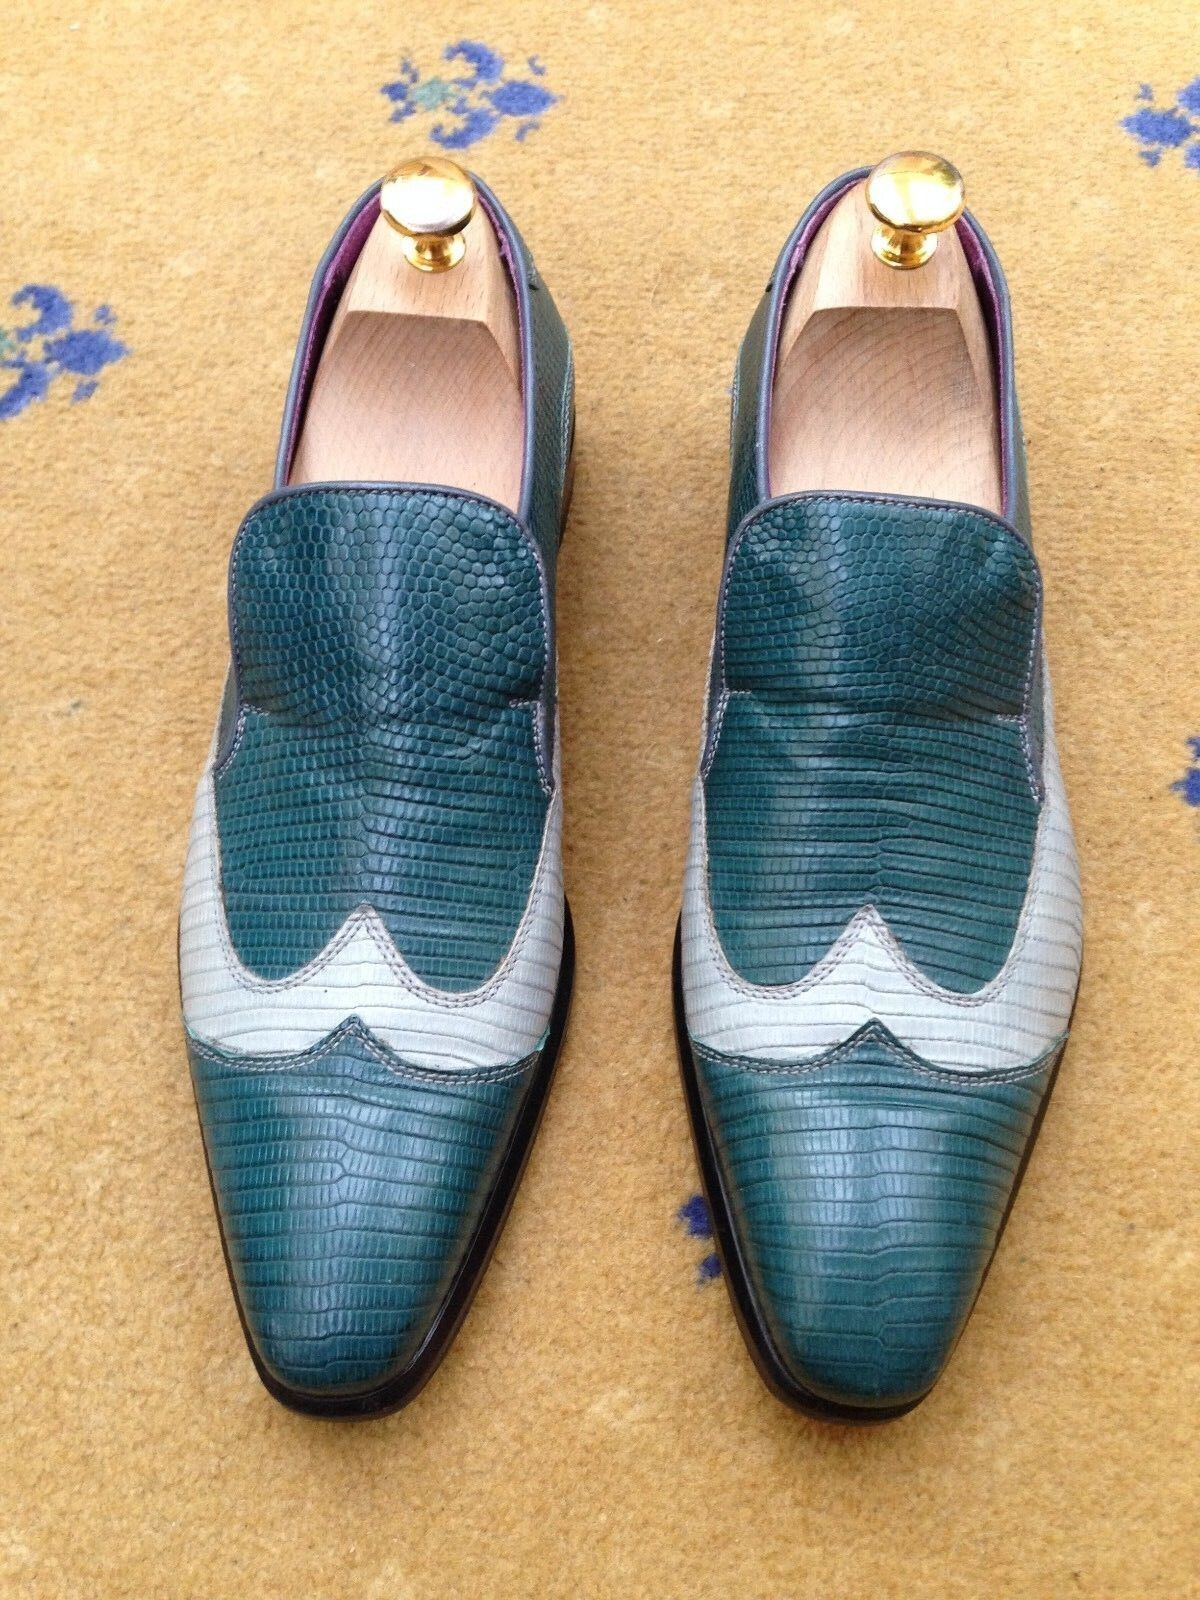 Oliver Sweeney Bespoke Mens Shoes Blue Leather Lizard Effect US 8.5 41.5